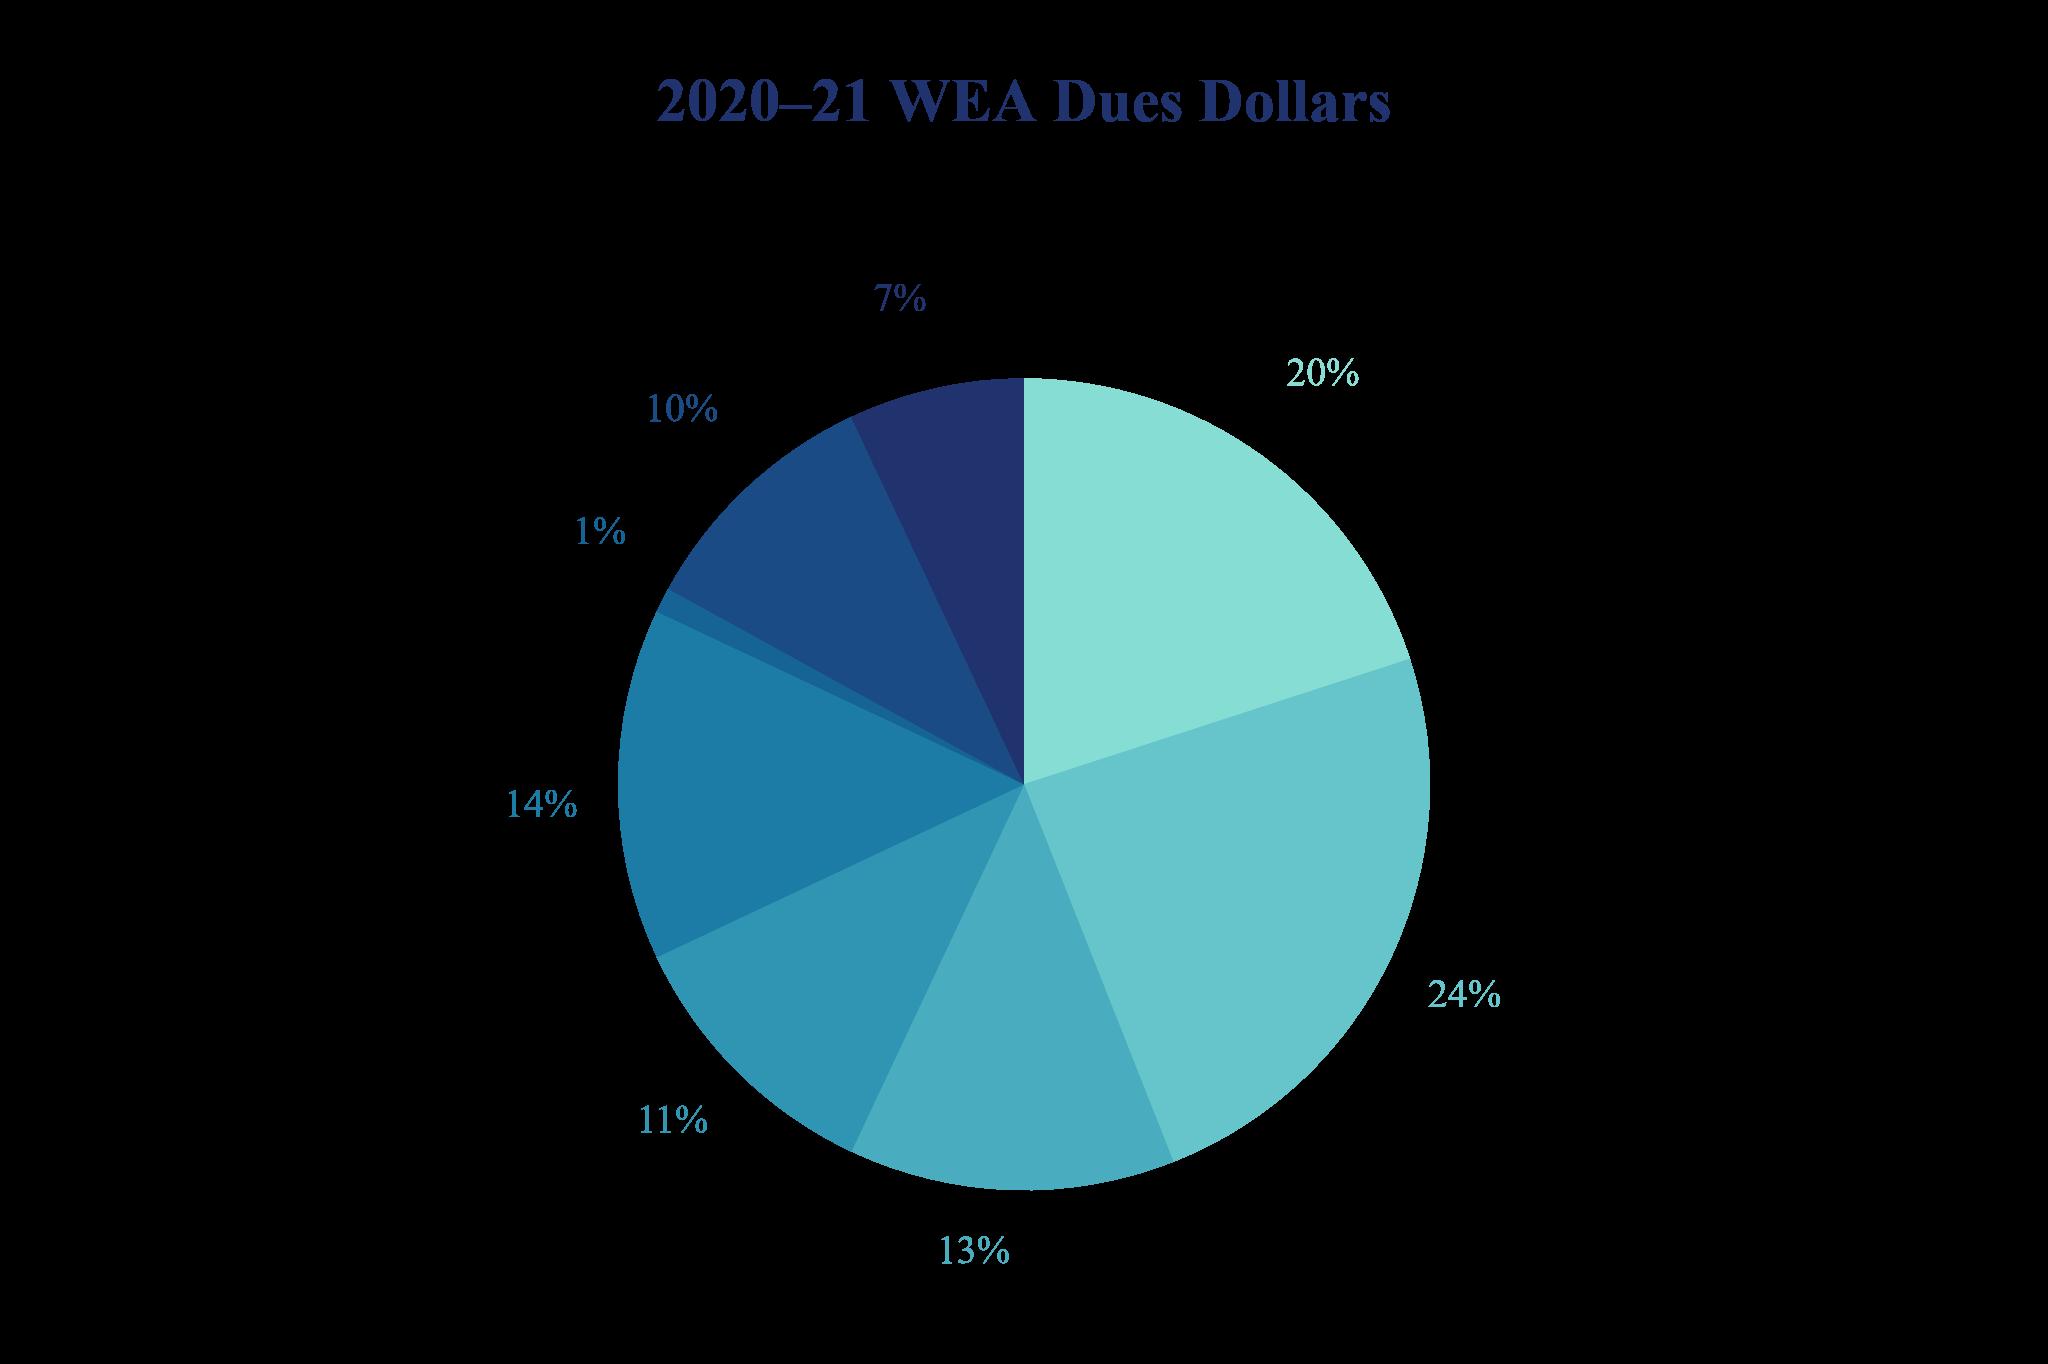 2020-21 WEA Dues Dollars